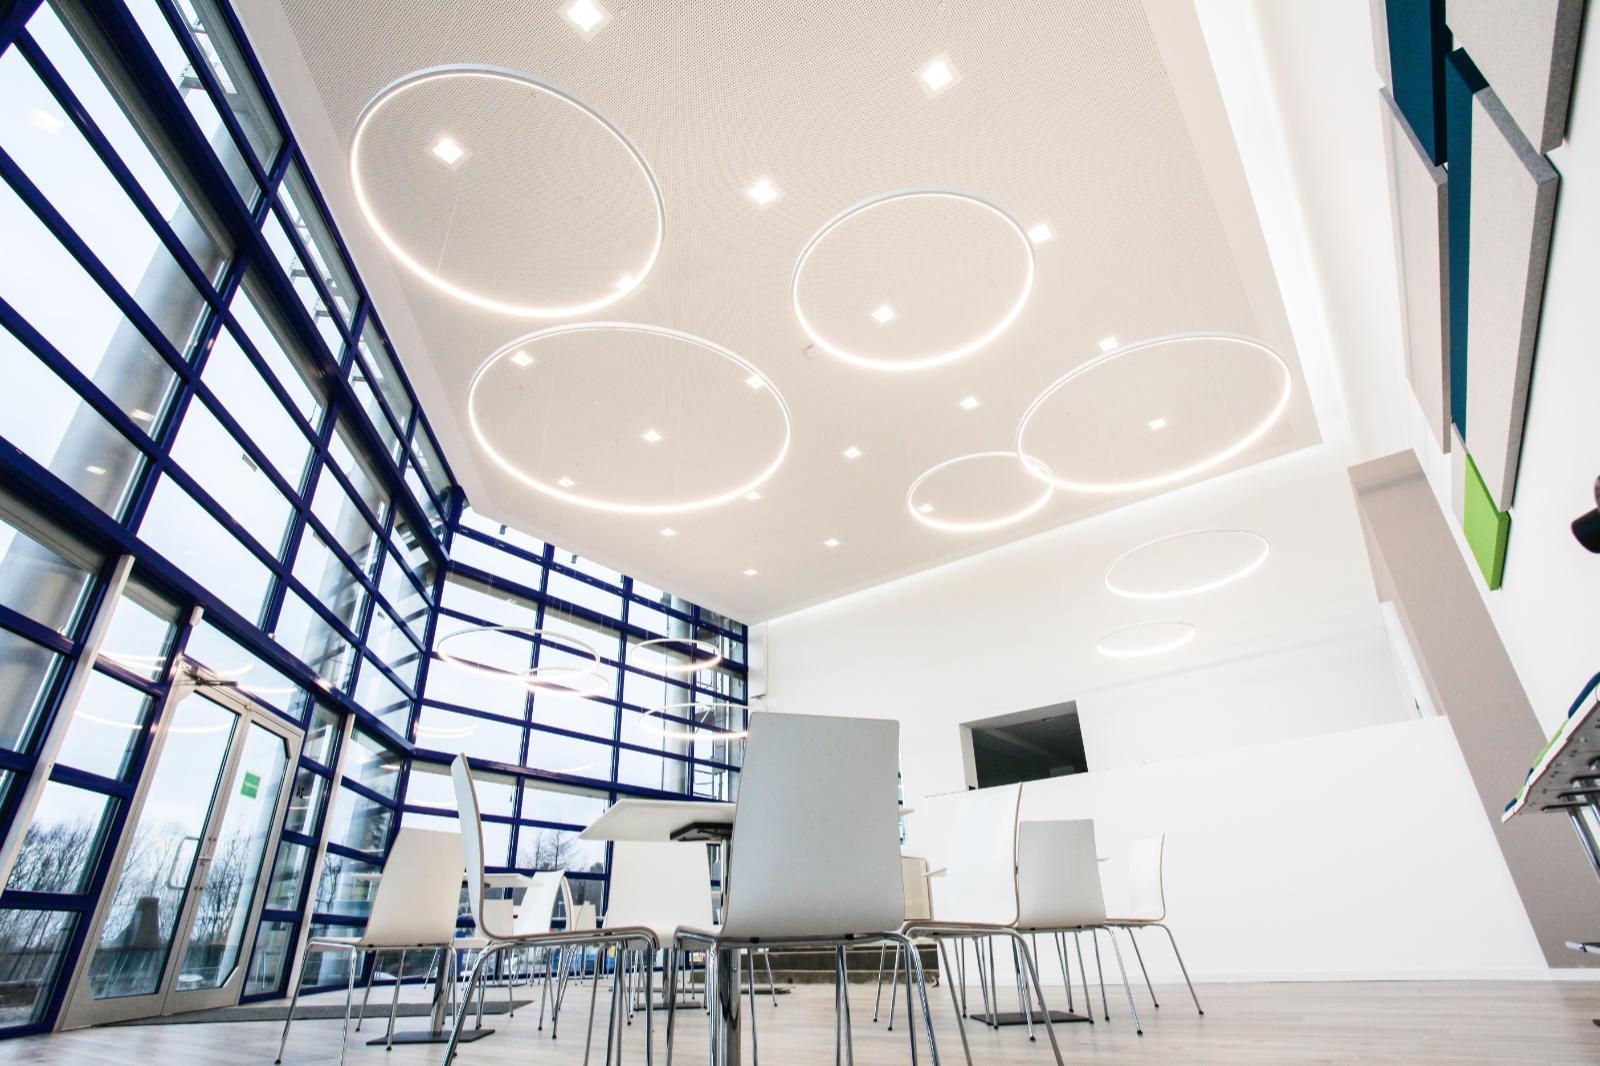 4 LED Pendelleuchten Loop Line in Deutschland